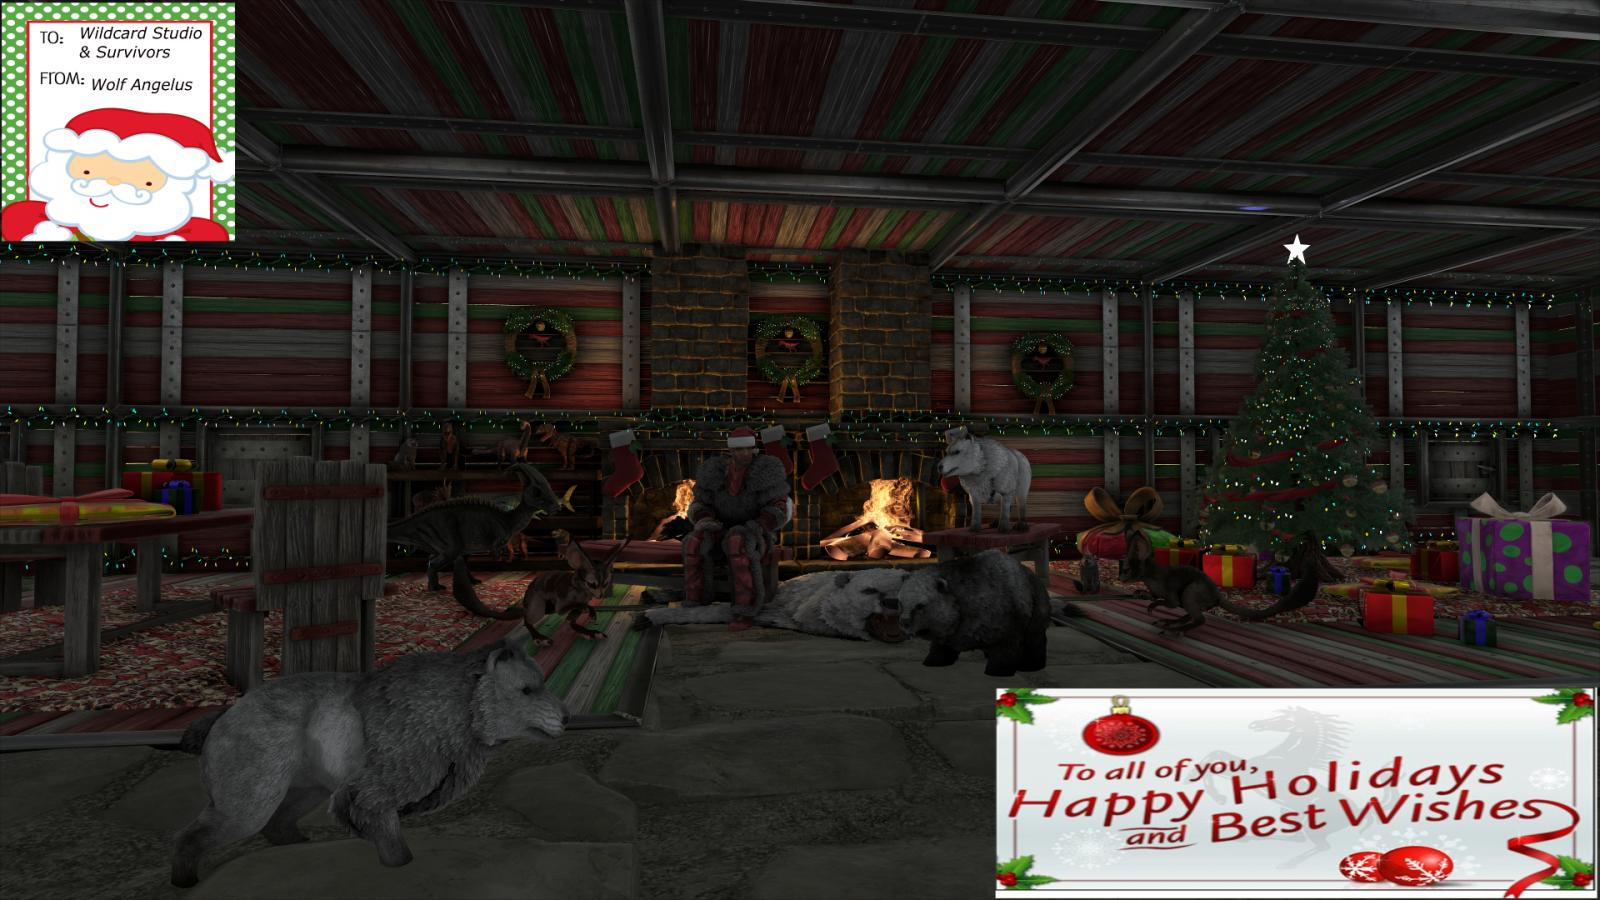 large.5866f4b2554b3_WolfAngelus-HolidayGreetings!-STA.jpg